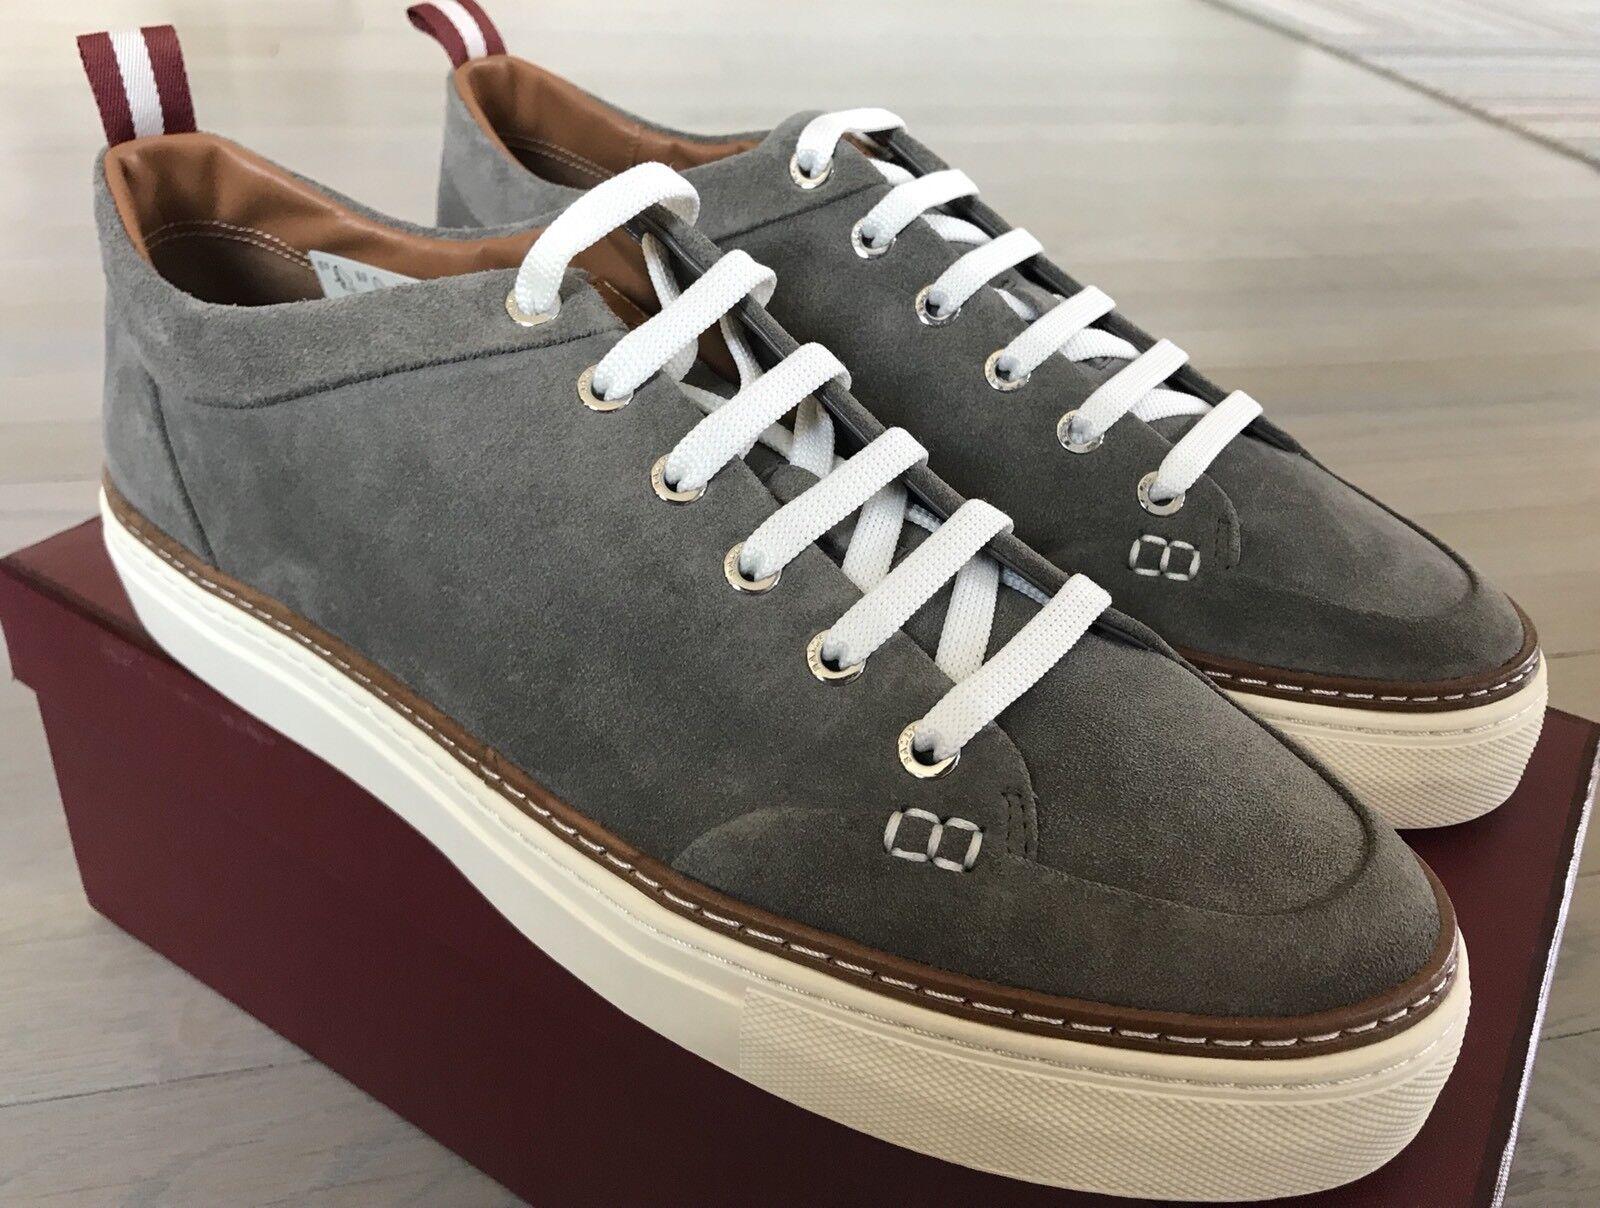 550$ Bally Hernando Gray Suede  Sneakers size US 11